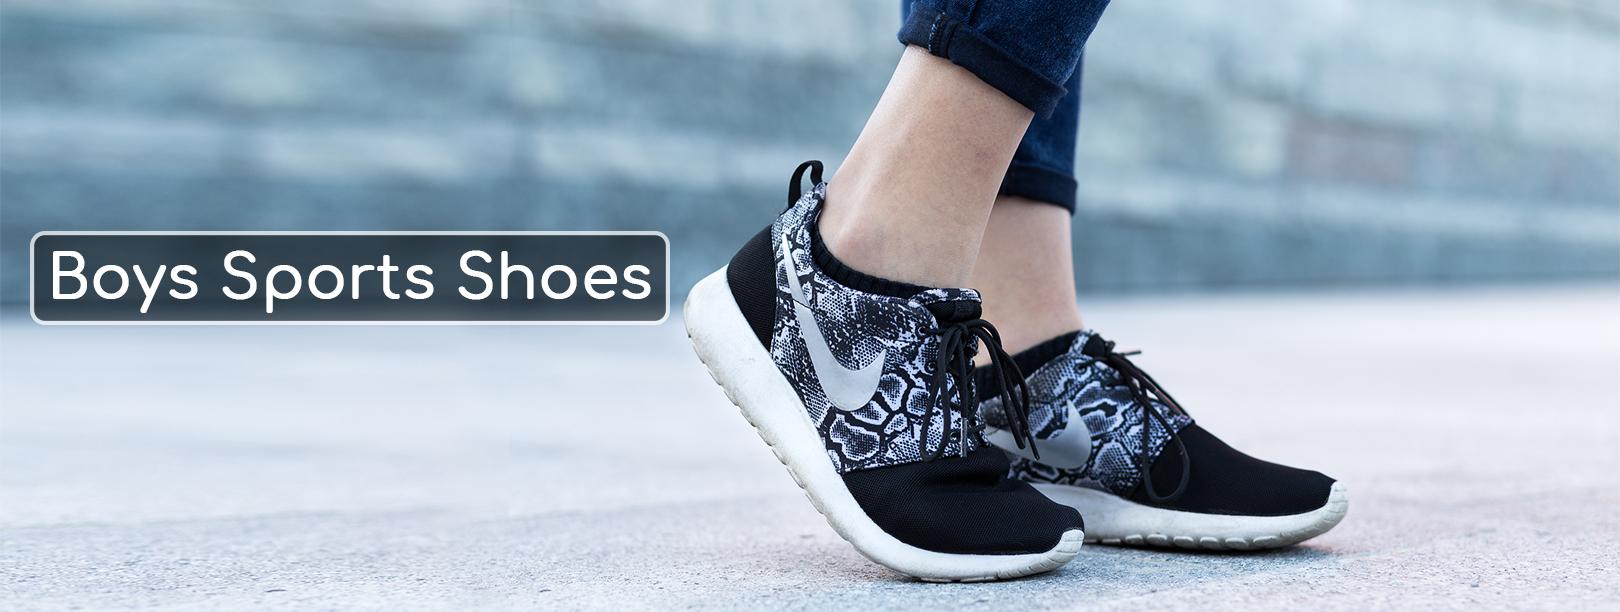 Myntra Boys Sports Shoes